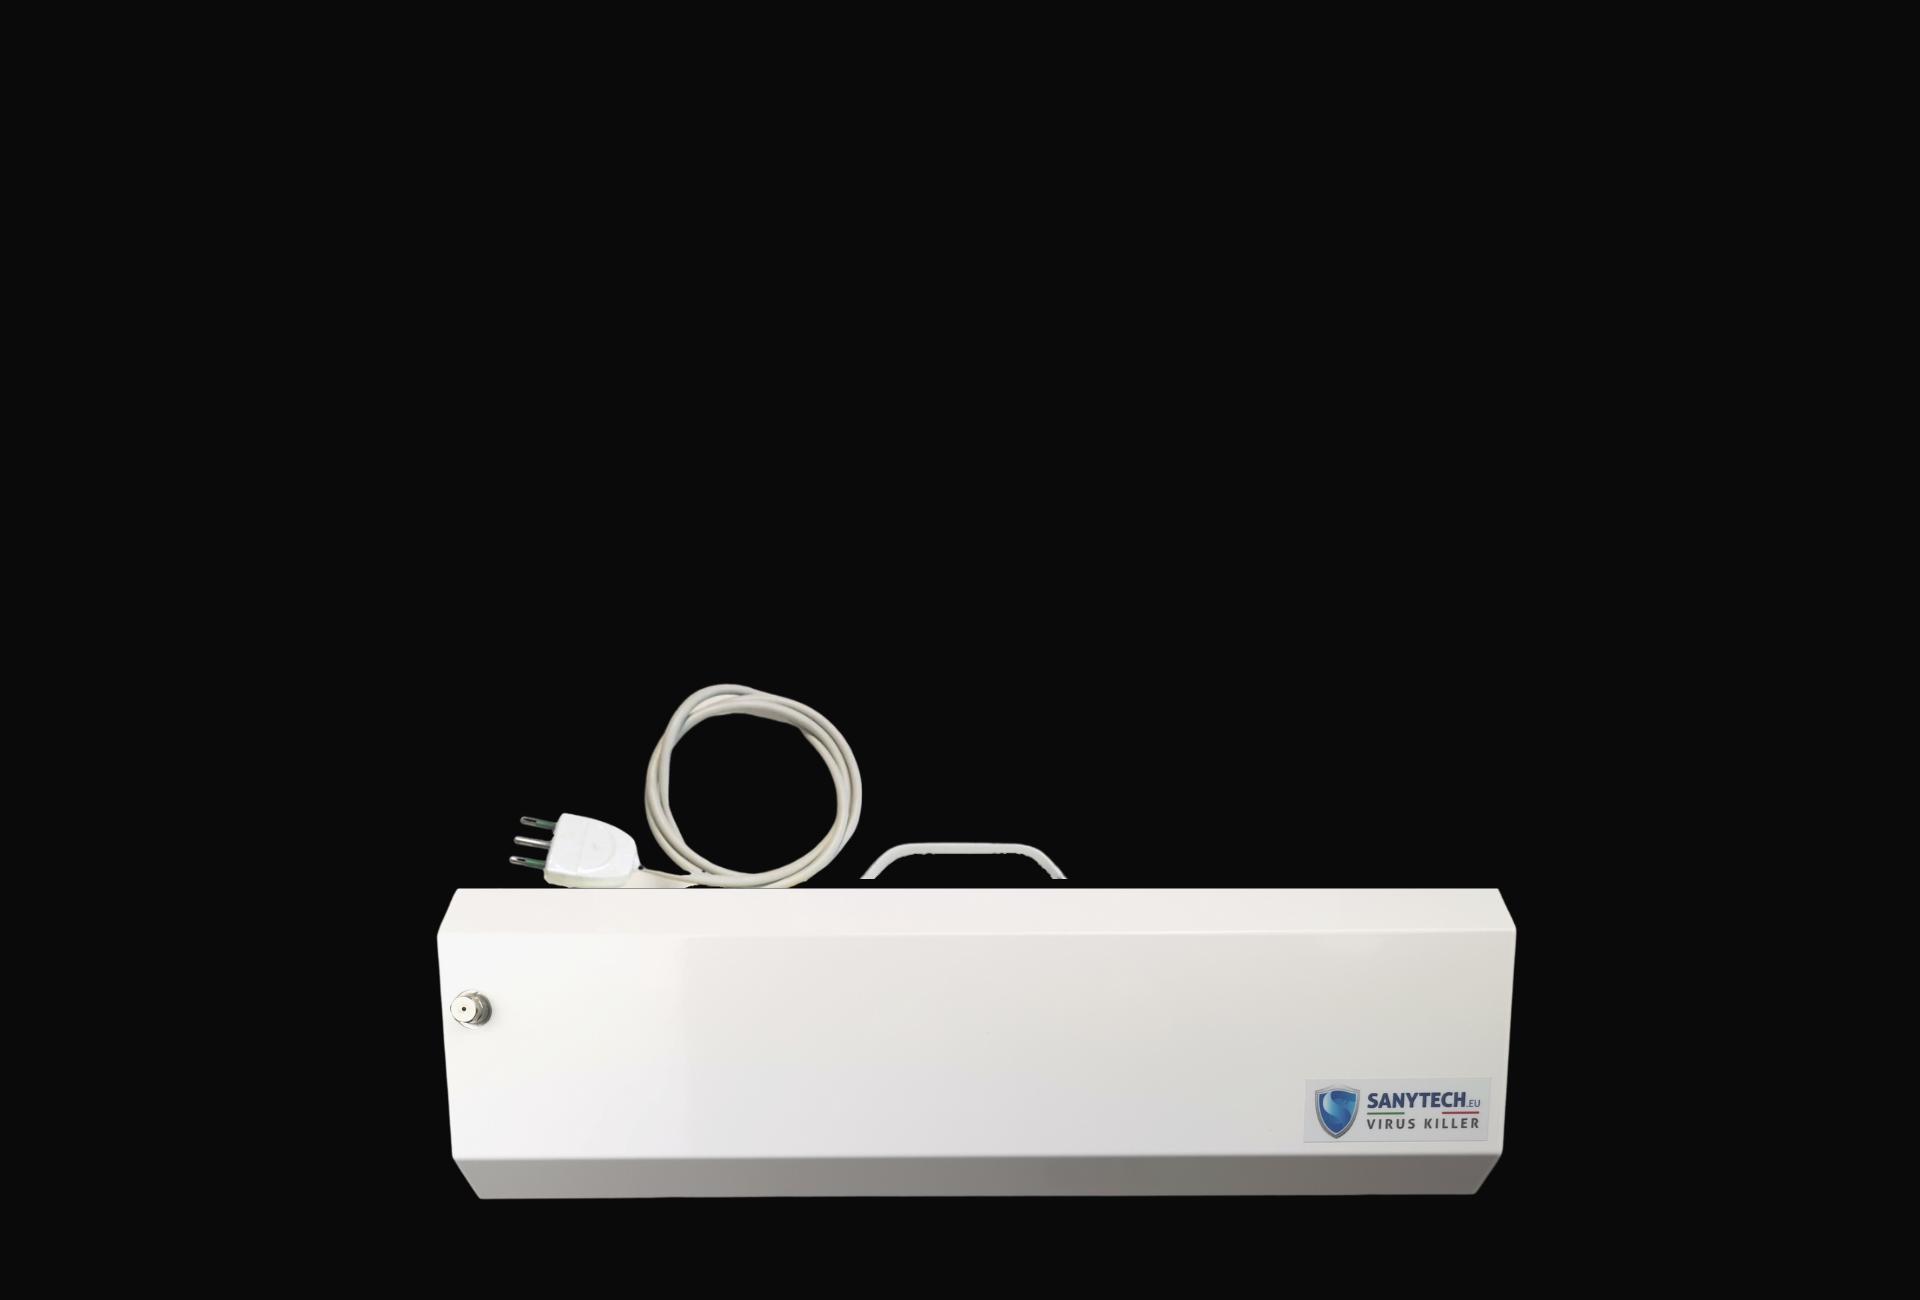 XS-25.TR sanificatore portatile sanytech